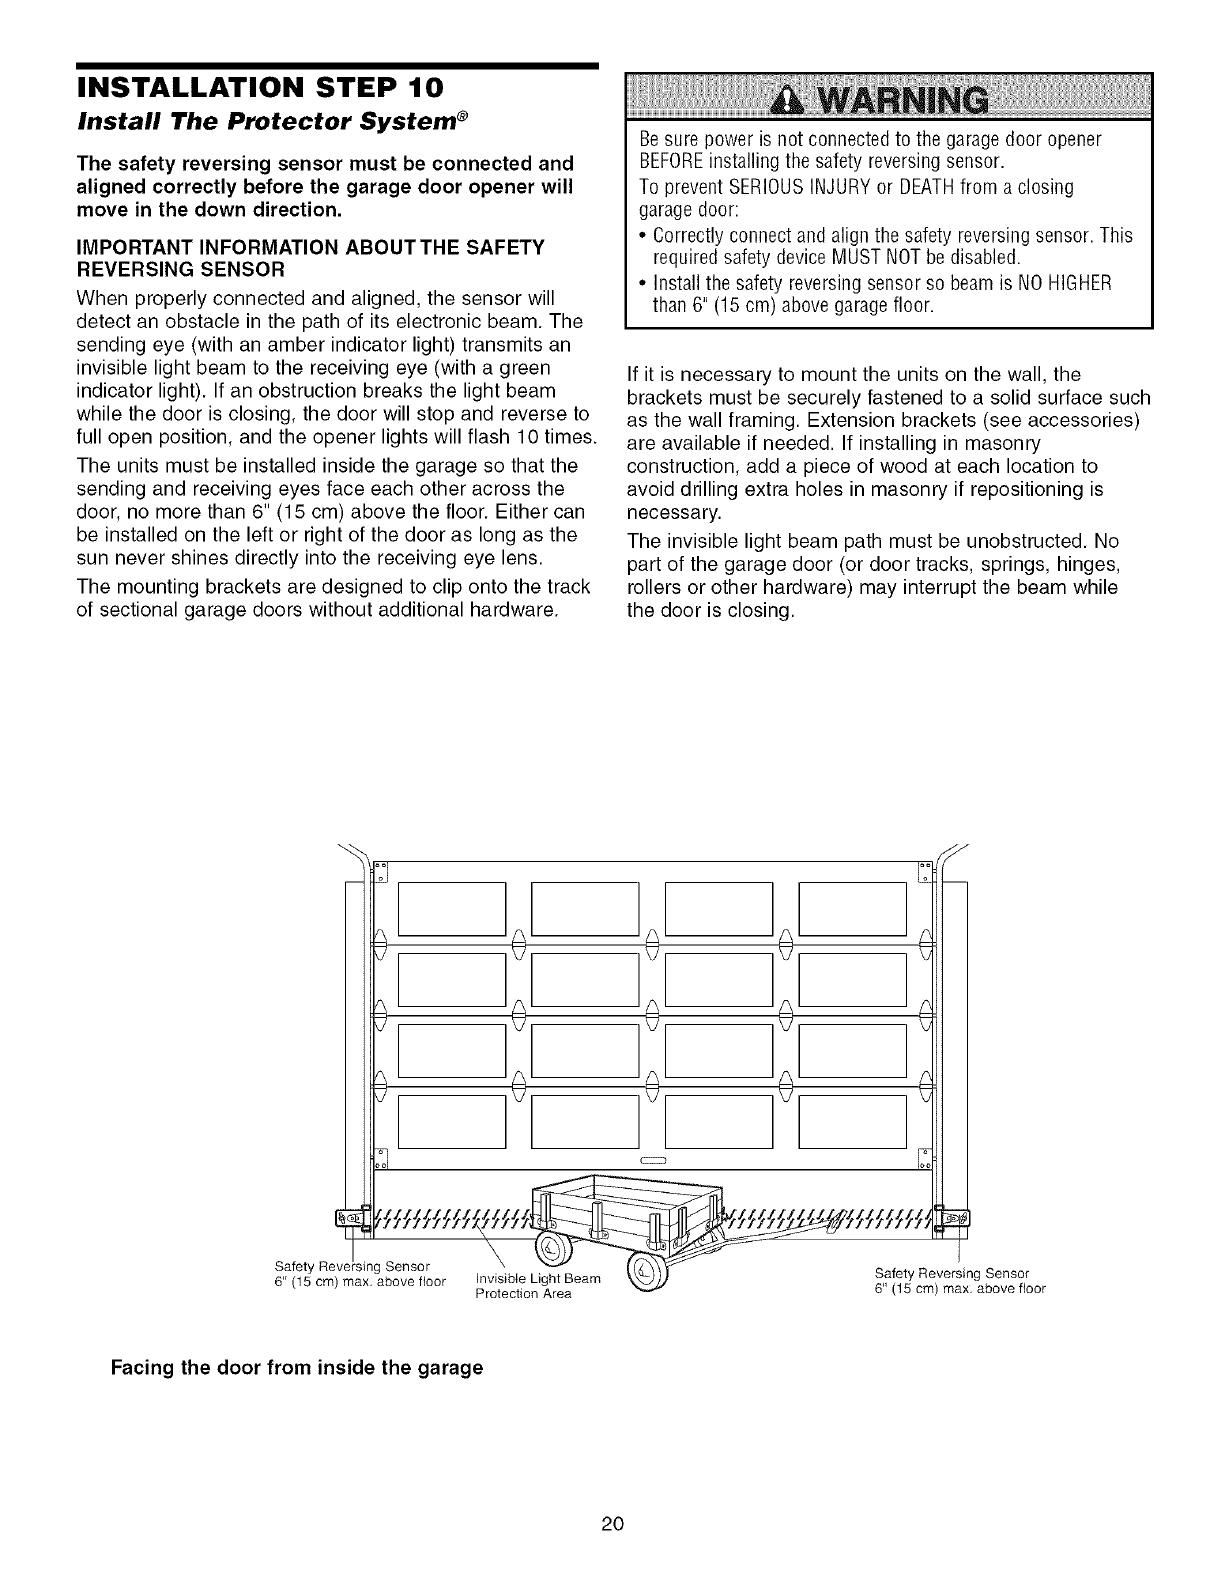 Garage Door Opener Safety Reversing Sensor Wiring Diagram Light For Craftsman 13953930dm User Manual Manuals And